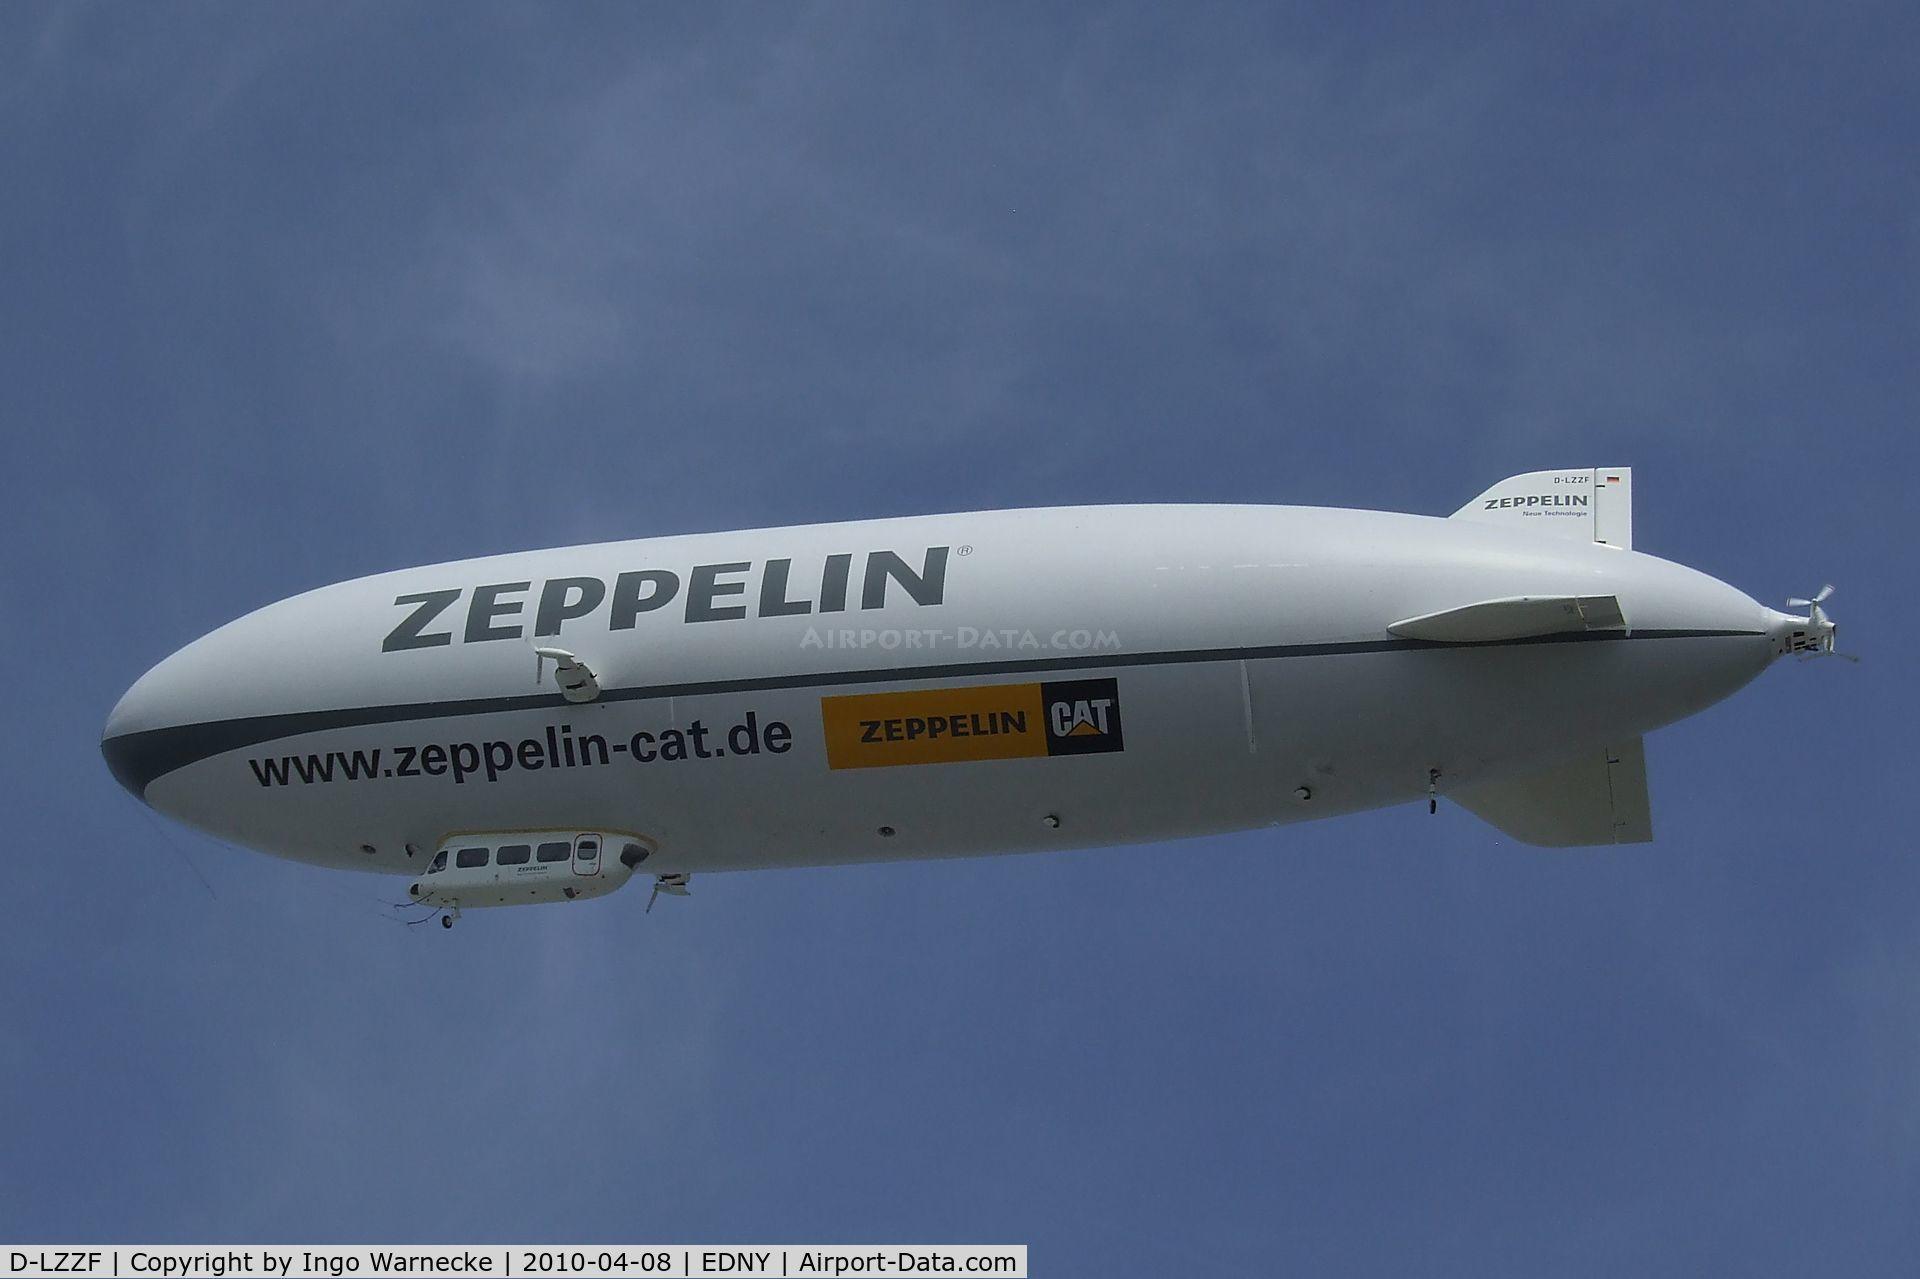 D-LZZF, 1998 Zeppelin LZ-N07 C/N 3, Zeppelin NT LZ-N07 at the AERO 2010, Friedrichshafen